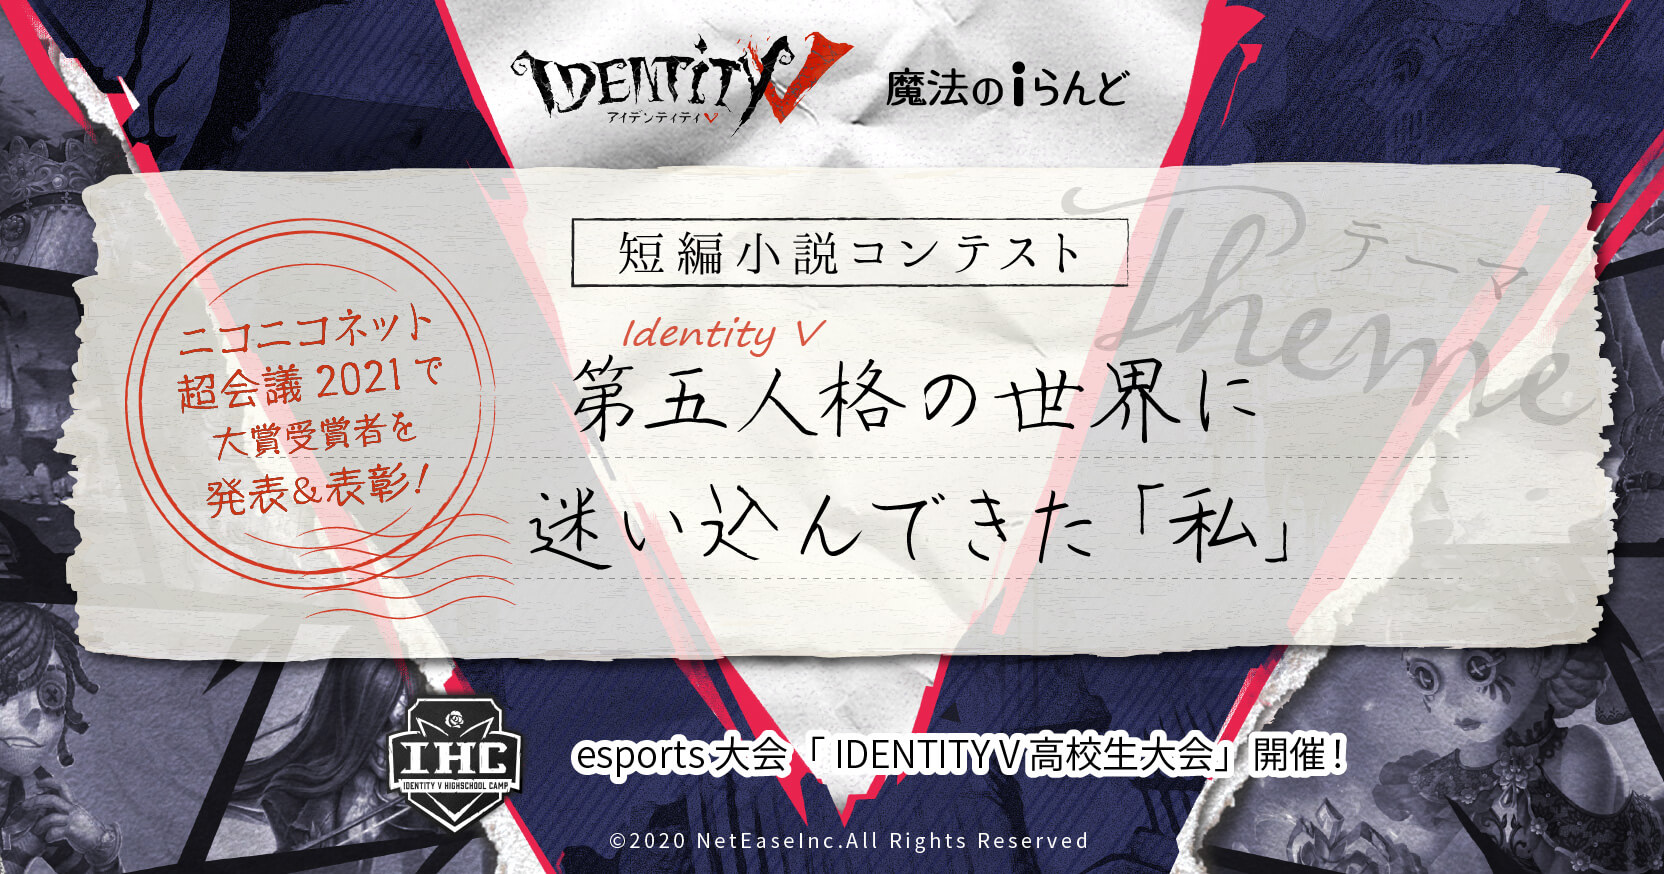 Identity V 魔法のiらんど 短編小説コンテスト 『Identity V 第五人格』の世界に迷い込んできた「私」